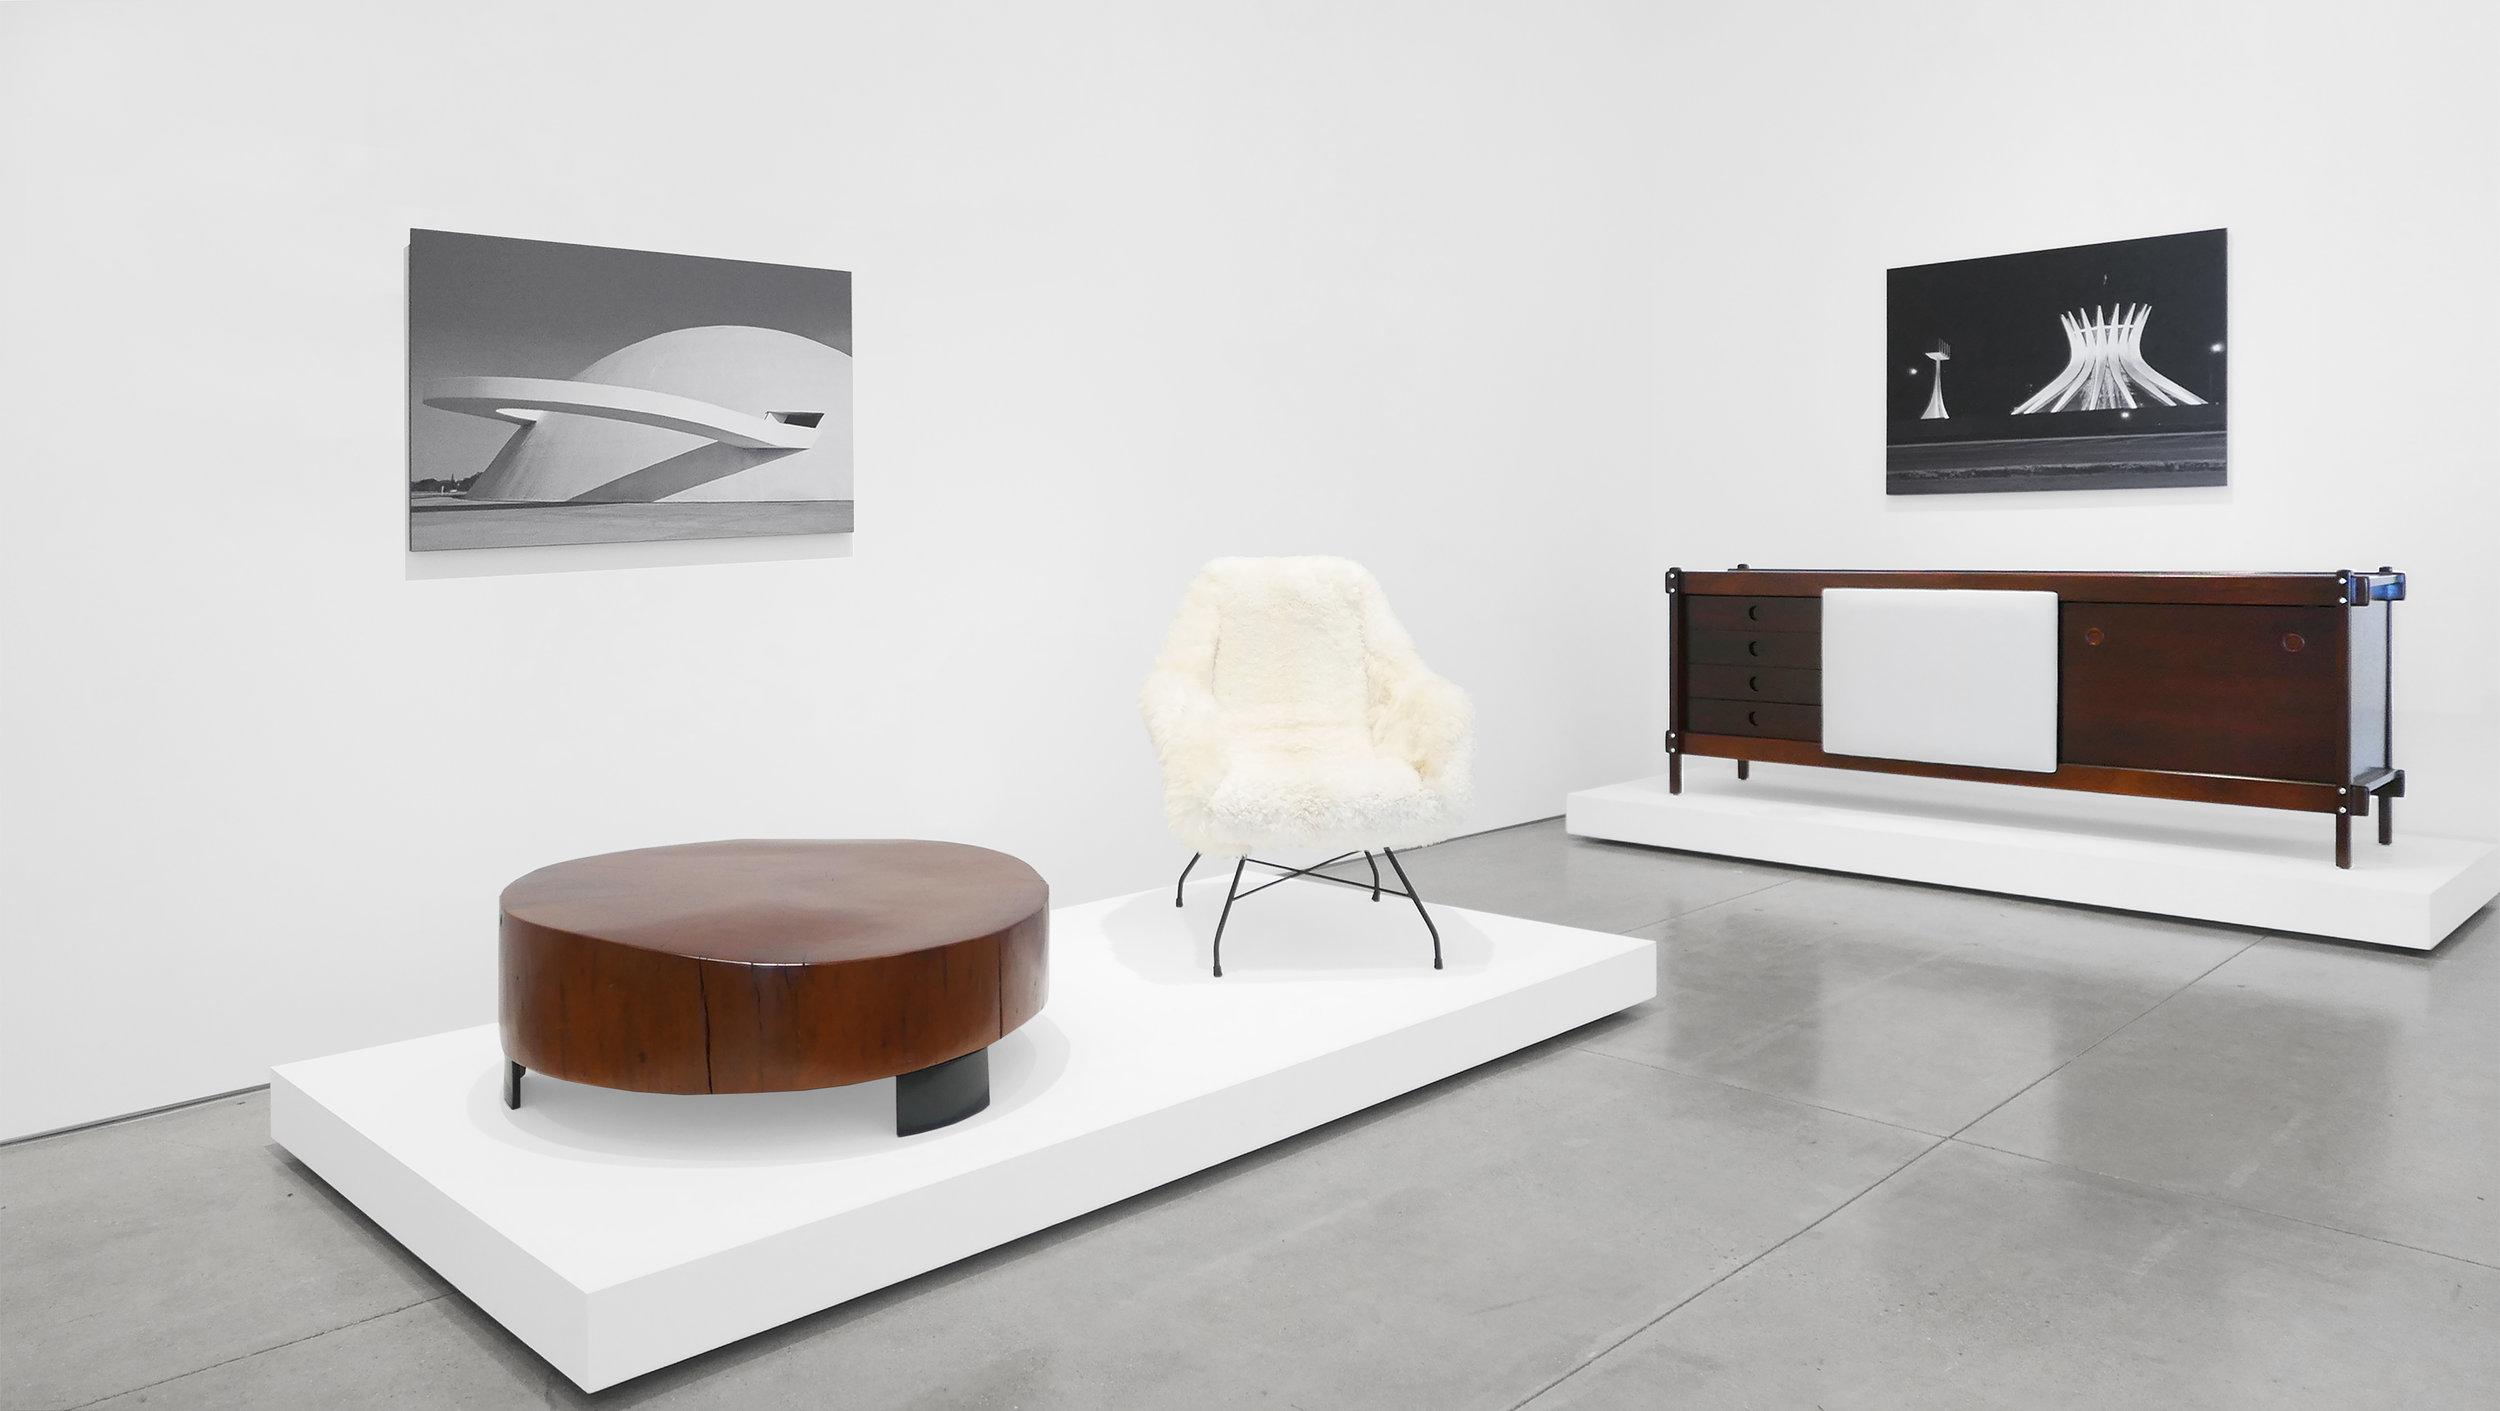 Design Brasileiro, Curated by Ulysses de Santi, Peter Blake Gallery, 2018, Installation View_11.jpg